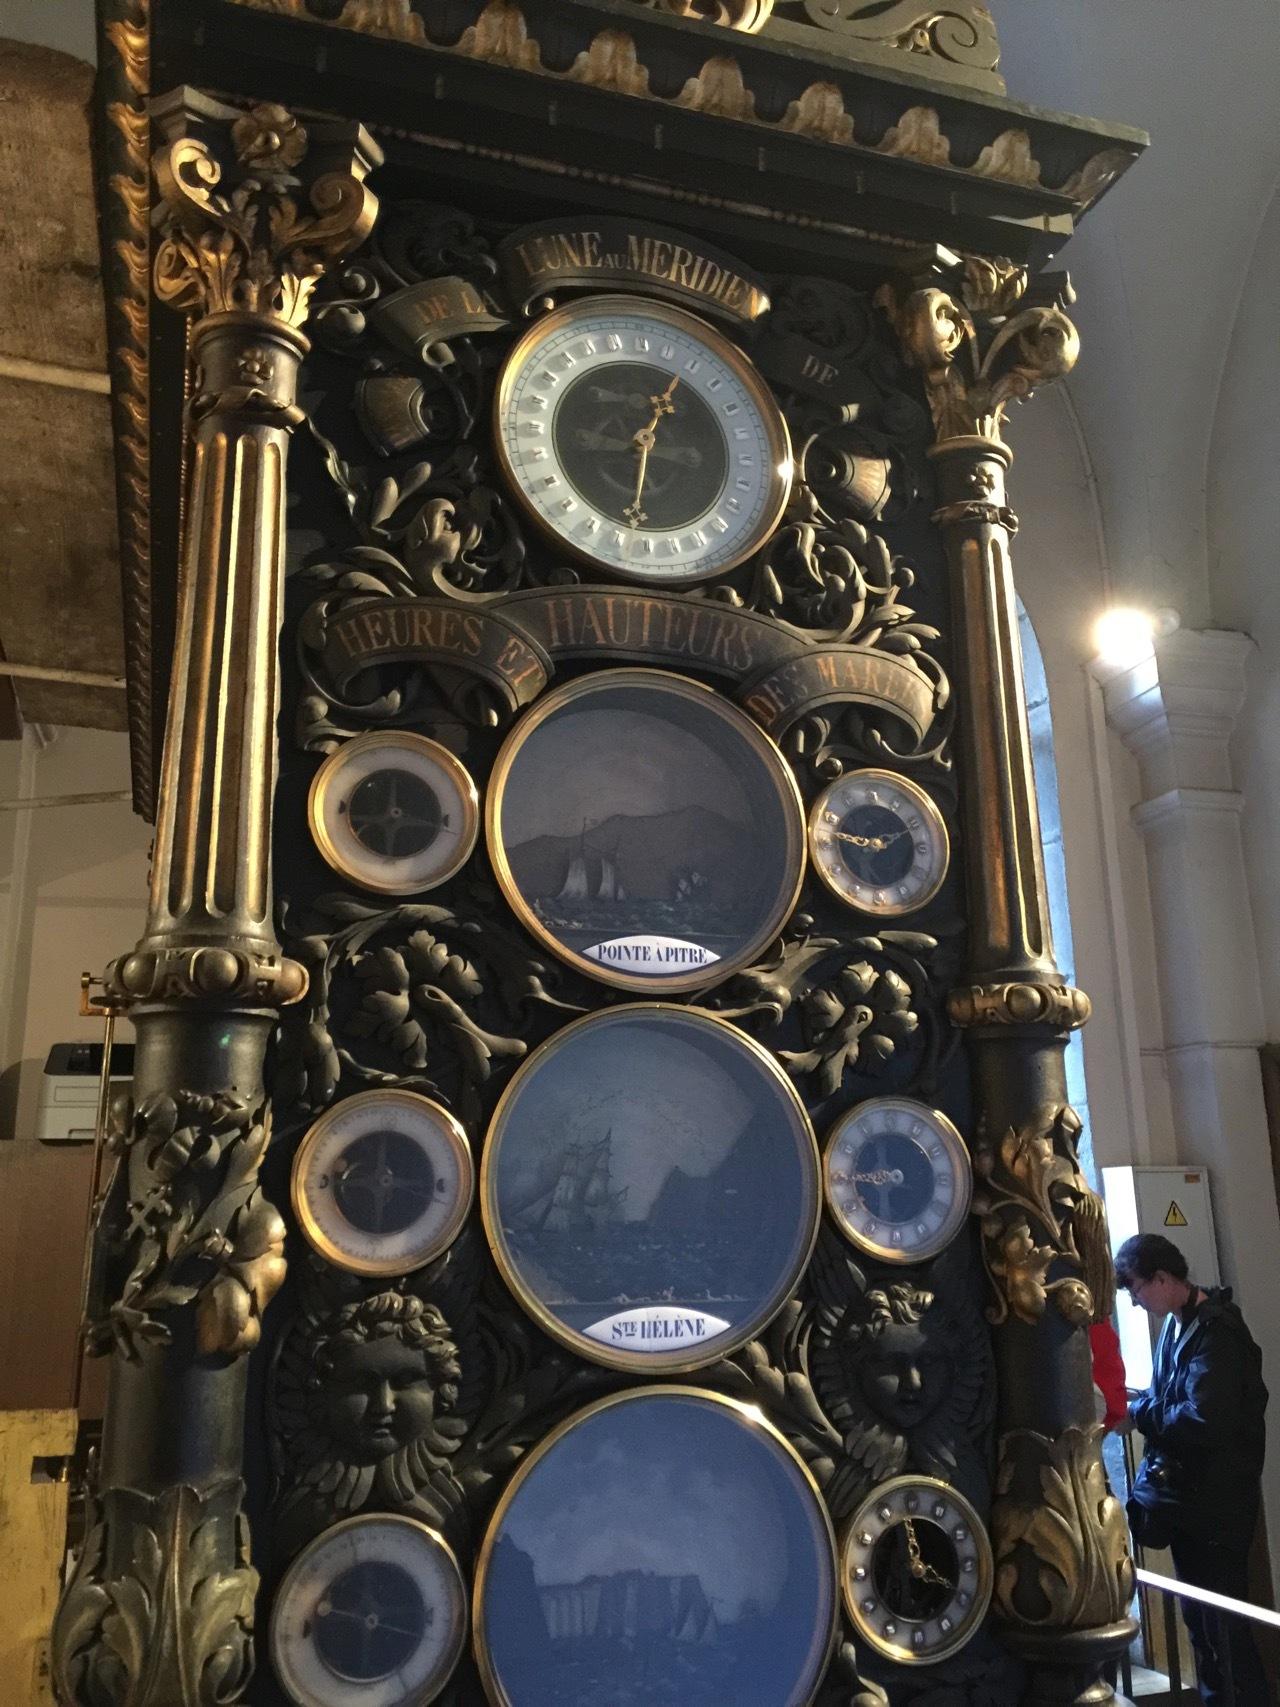 Time 1 by Claudio Raspollini